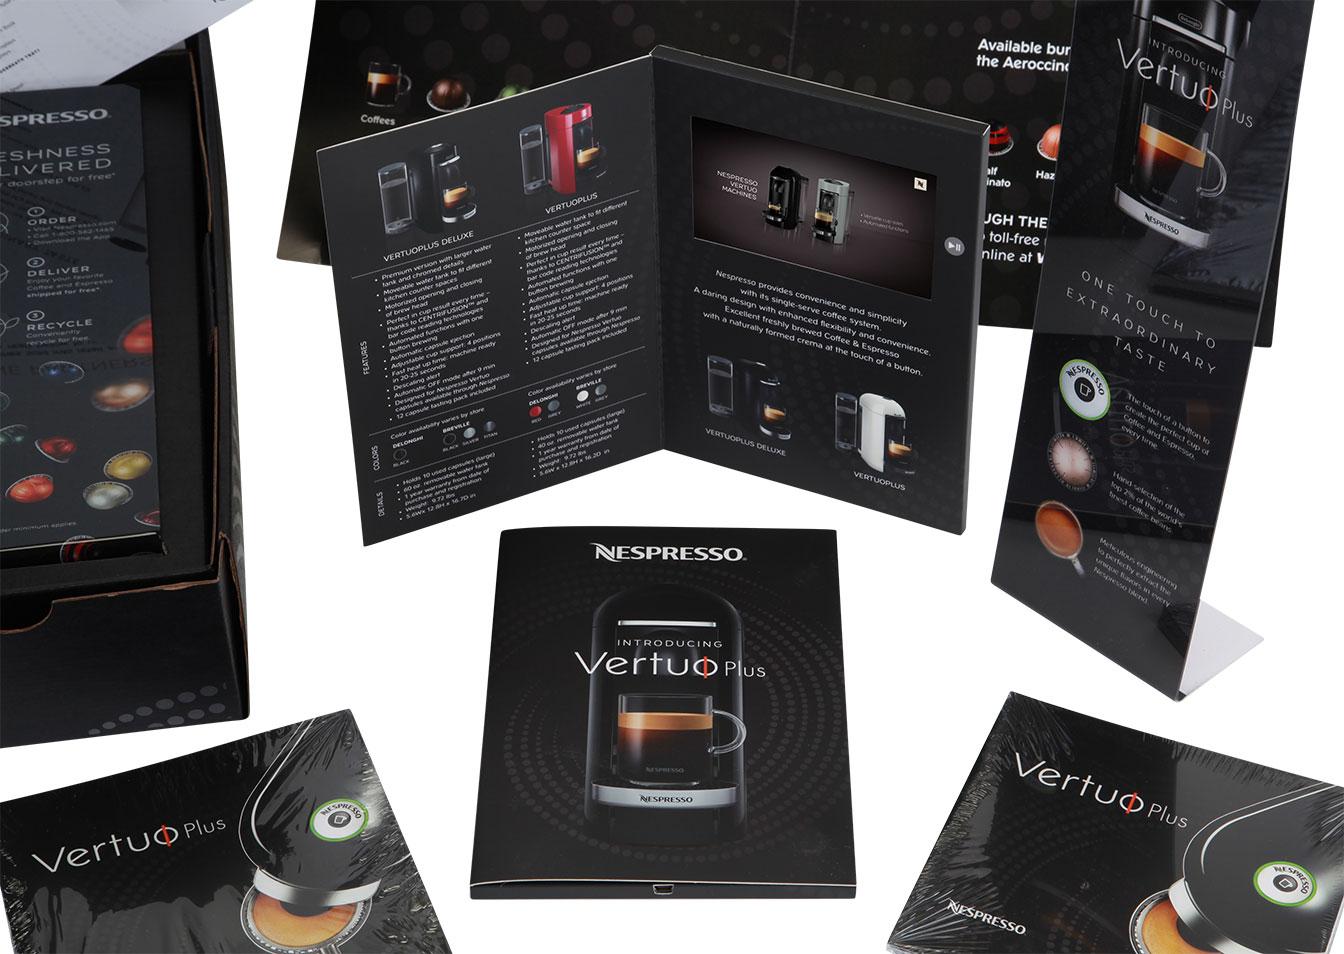 nespressoPackage2